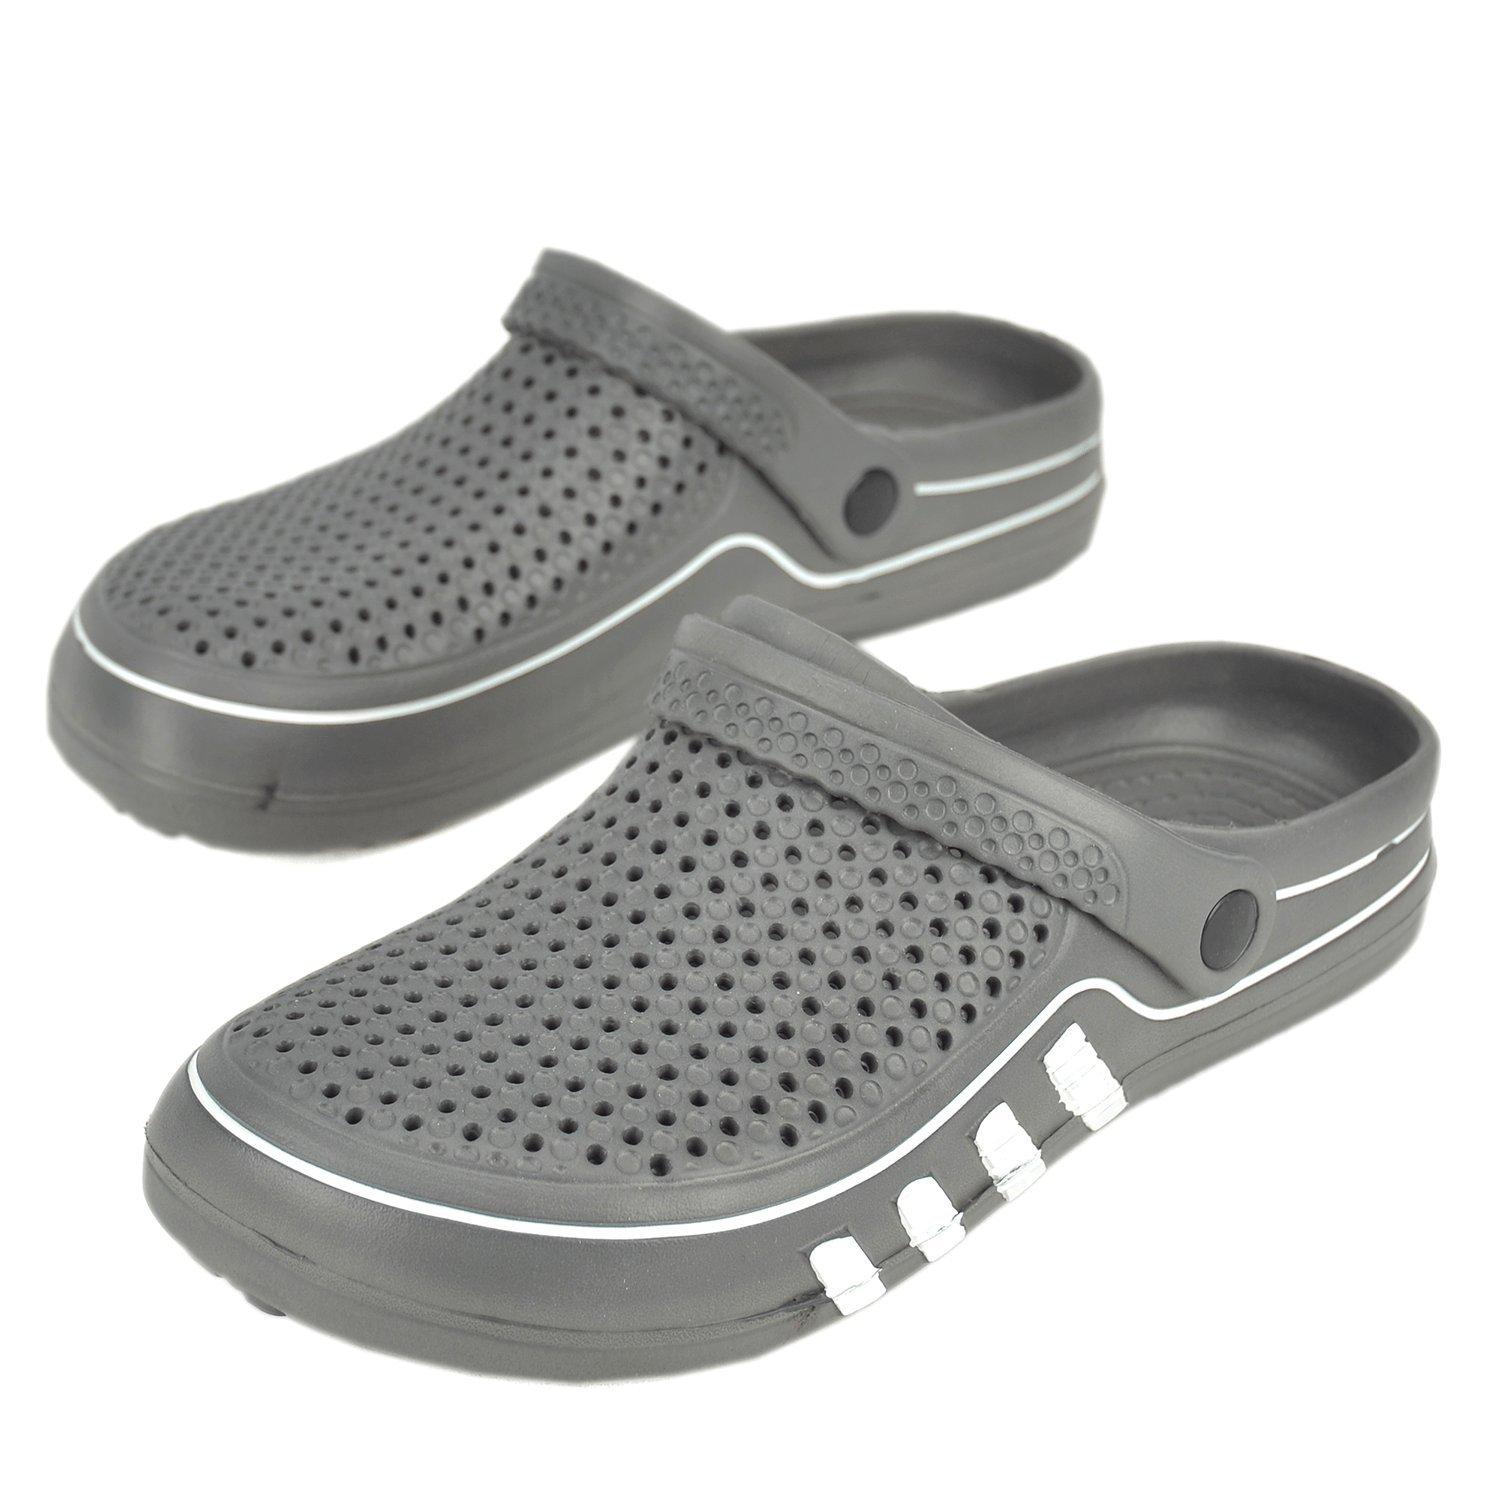 Maya Karis Purse MKP Collection Unisex Outdoor Clogs Sandals Lightweight Summer Slippers Indoor Home Shoes (7 US Men/9 US Women M, Grey/White) by Maya Karis Purse